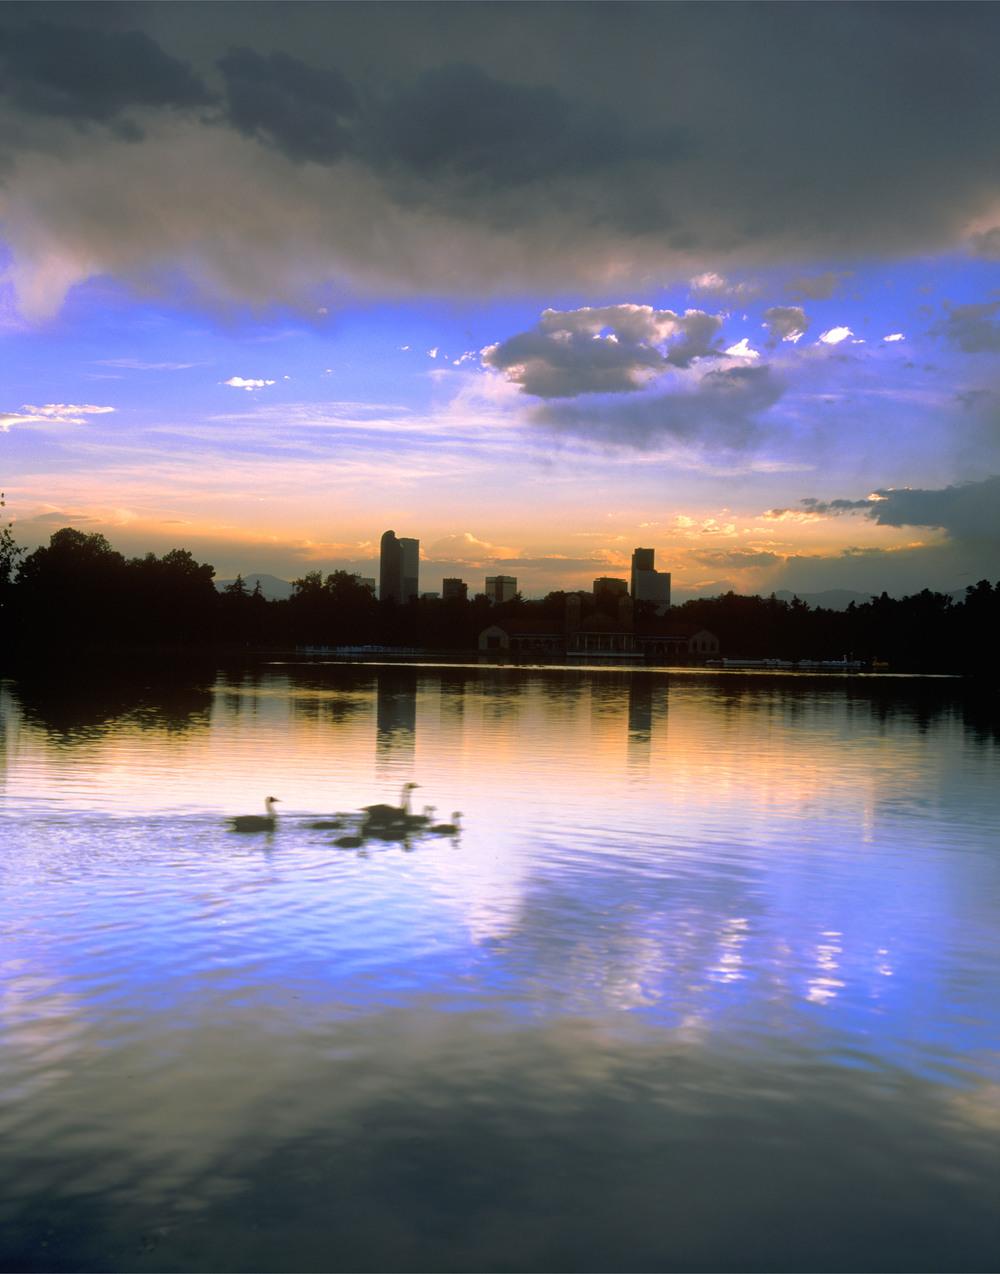 Denver at Sunset from City Park Lake